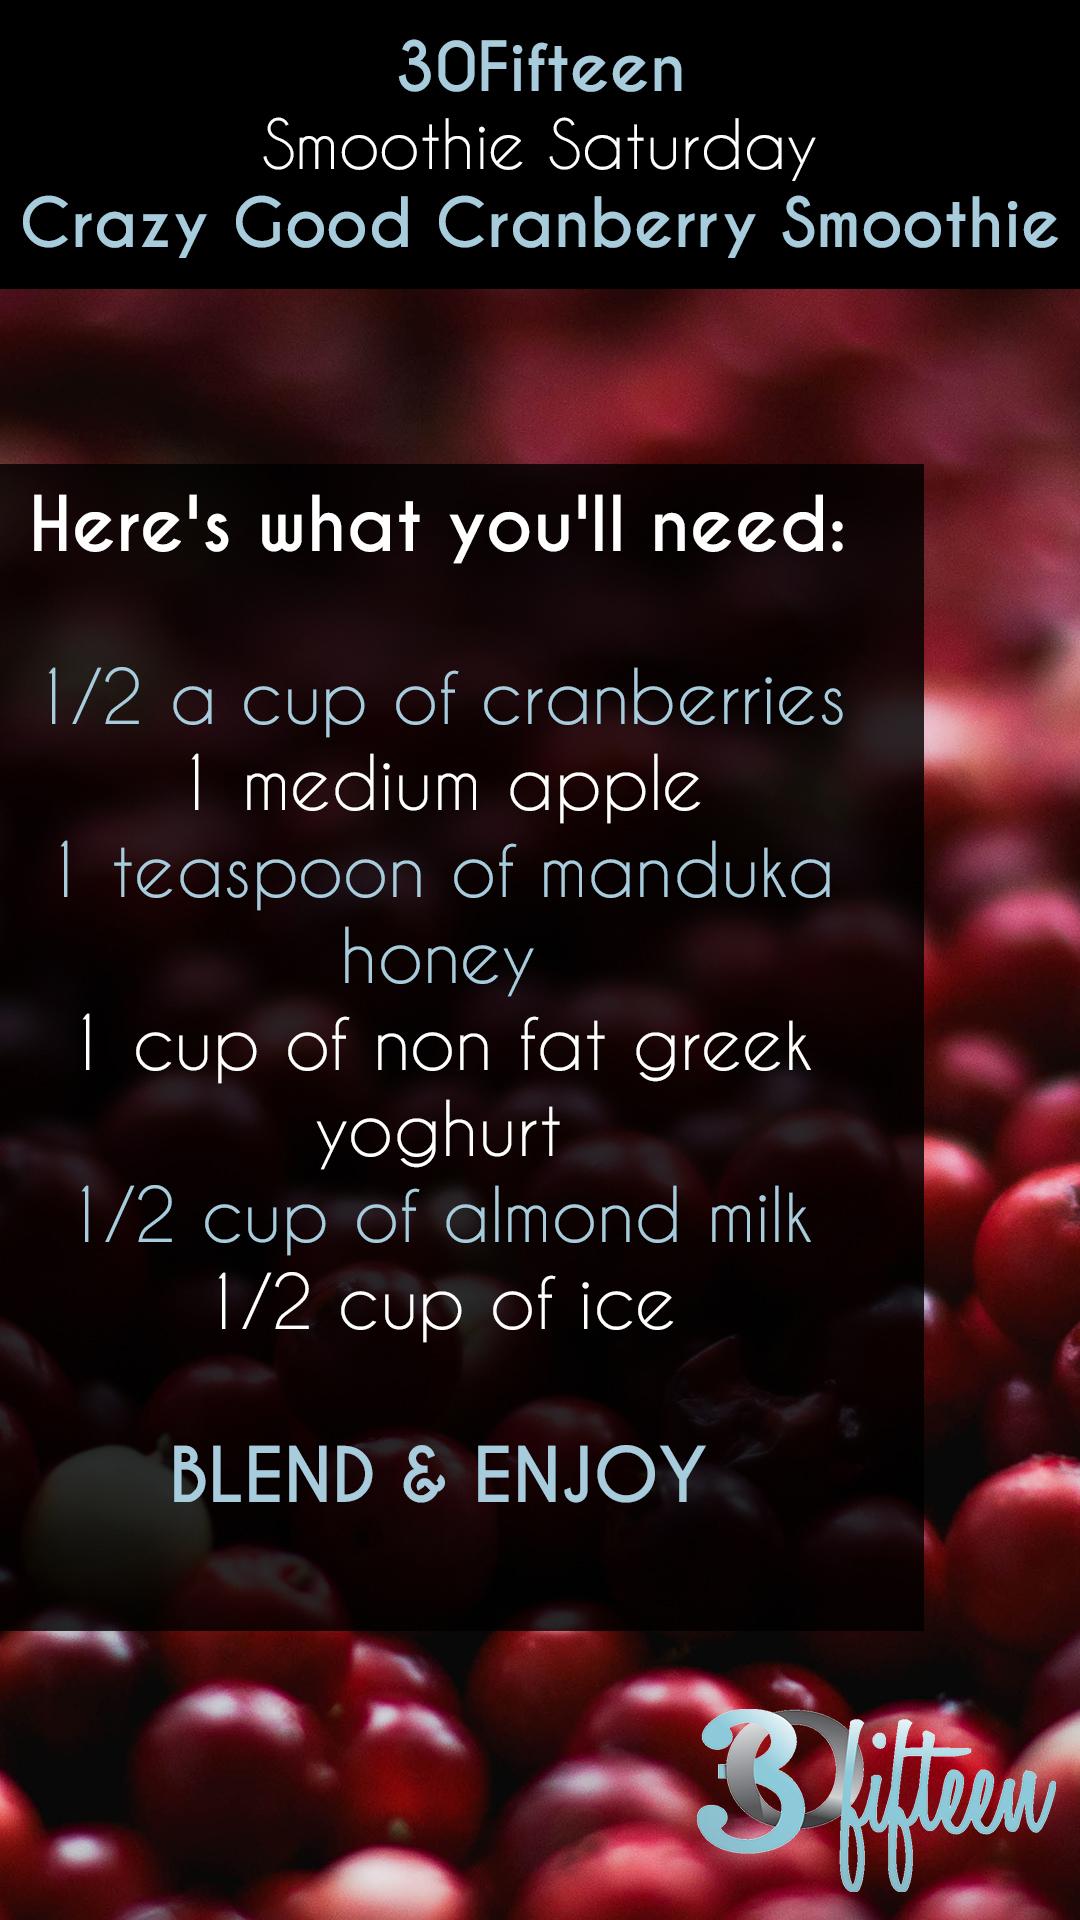 30Fifteen Cranberry smoothie recipe.jpg